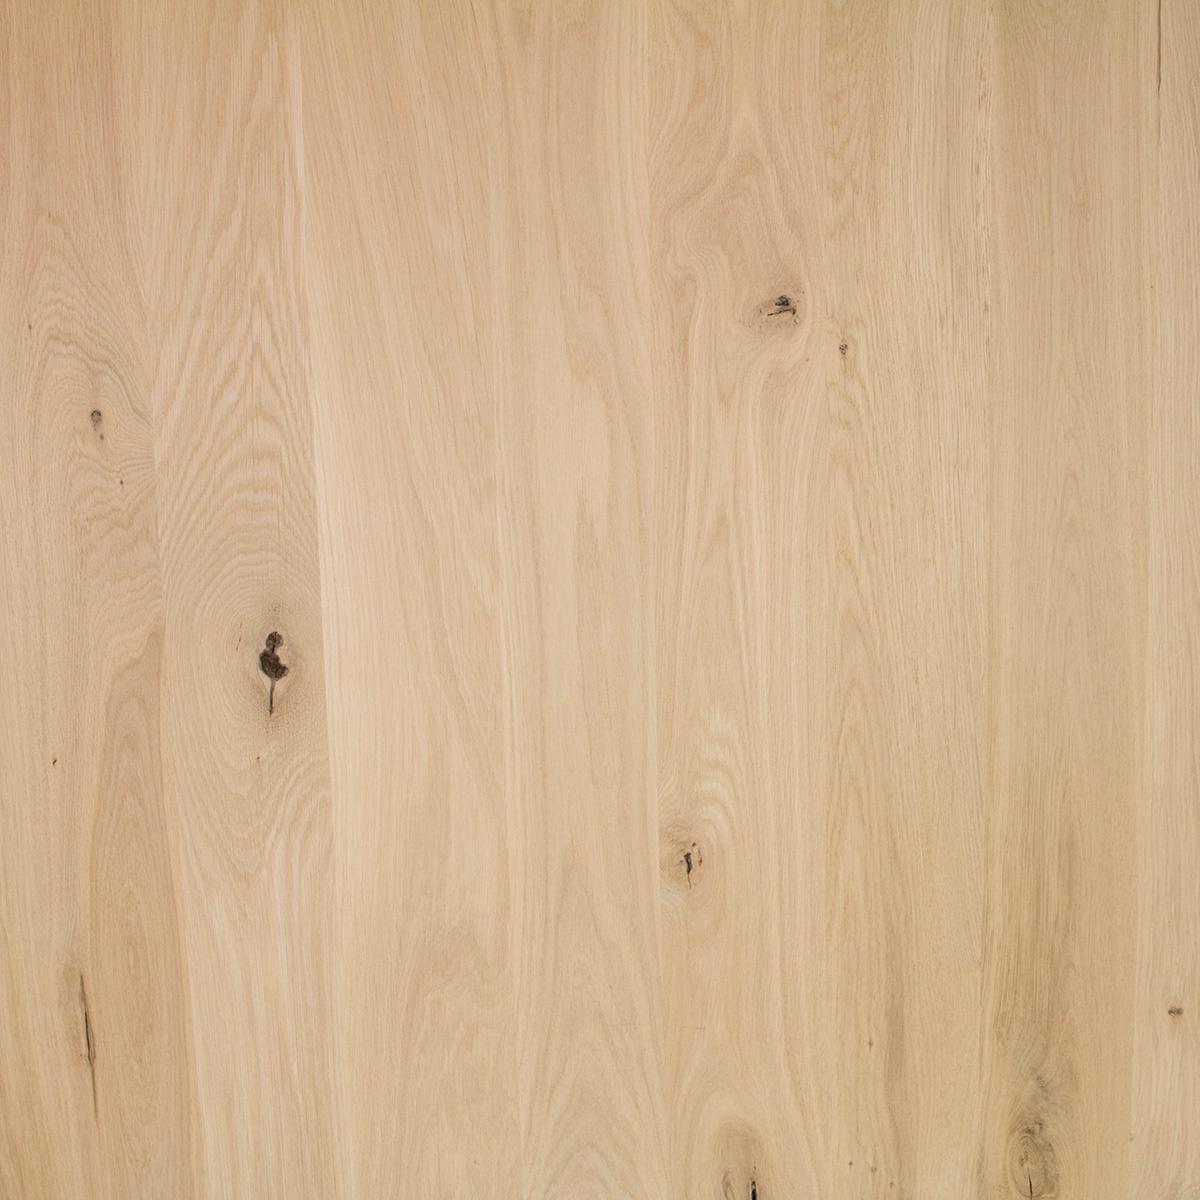 Eiken paneel rustiek 2 cm - 122 cm breed - vaste lengtestaffels - Meubelblad 8-12% kd Europees eikenhout